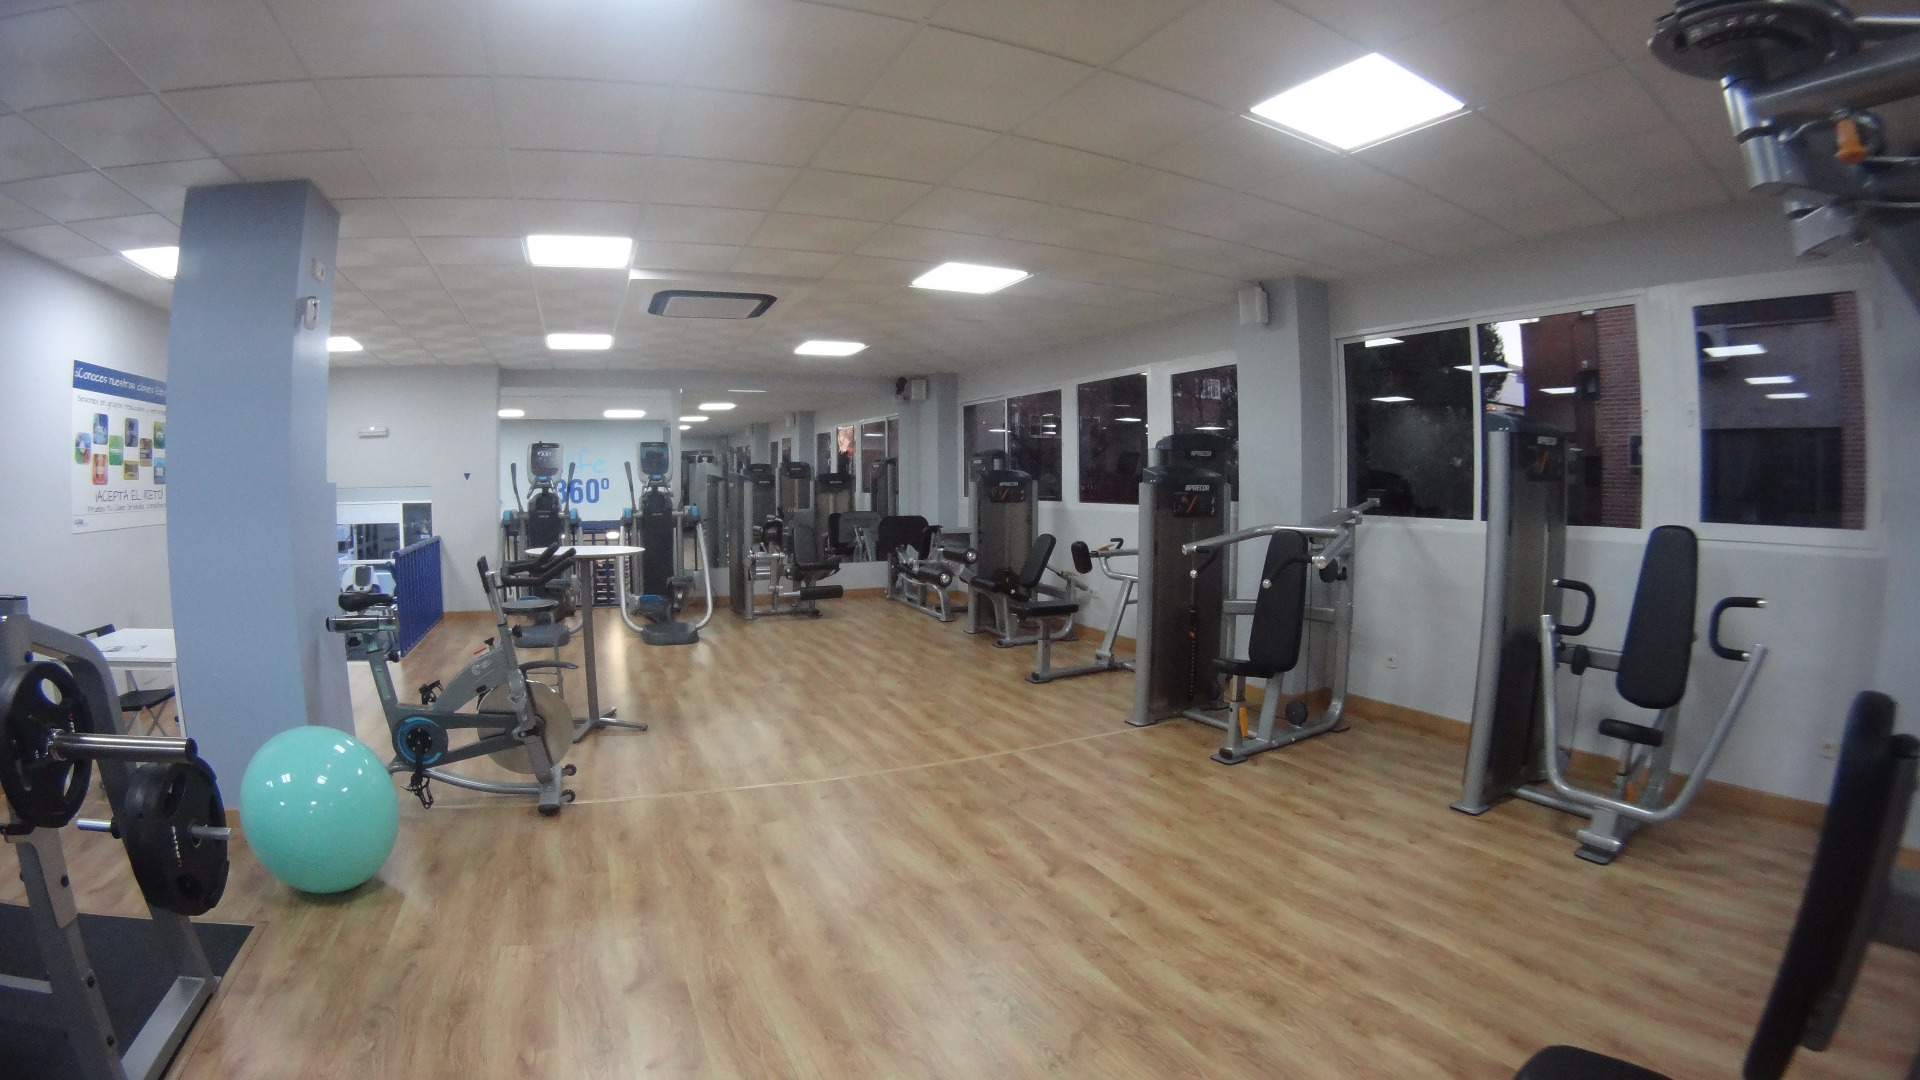 Oferta gimnasio fitness 360 life emilio vargas madrid for Gimnasio hortaleza fitness